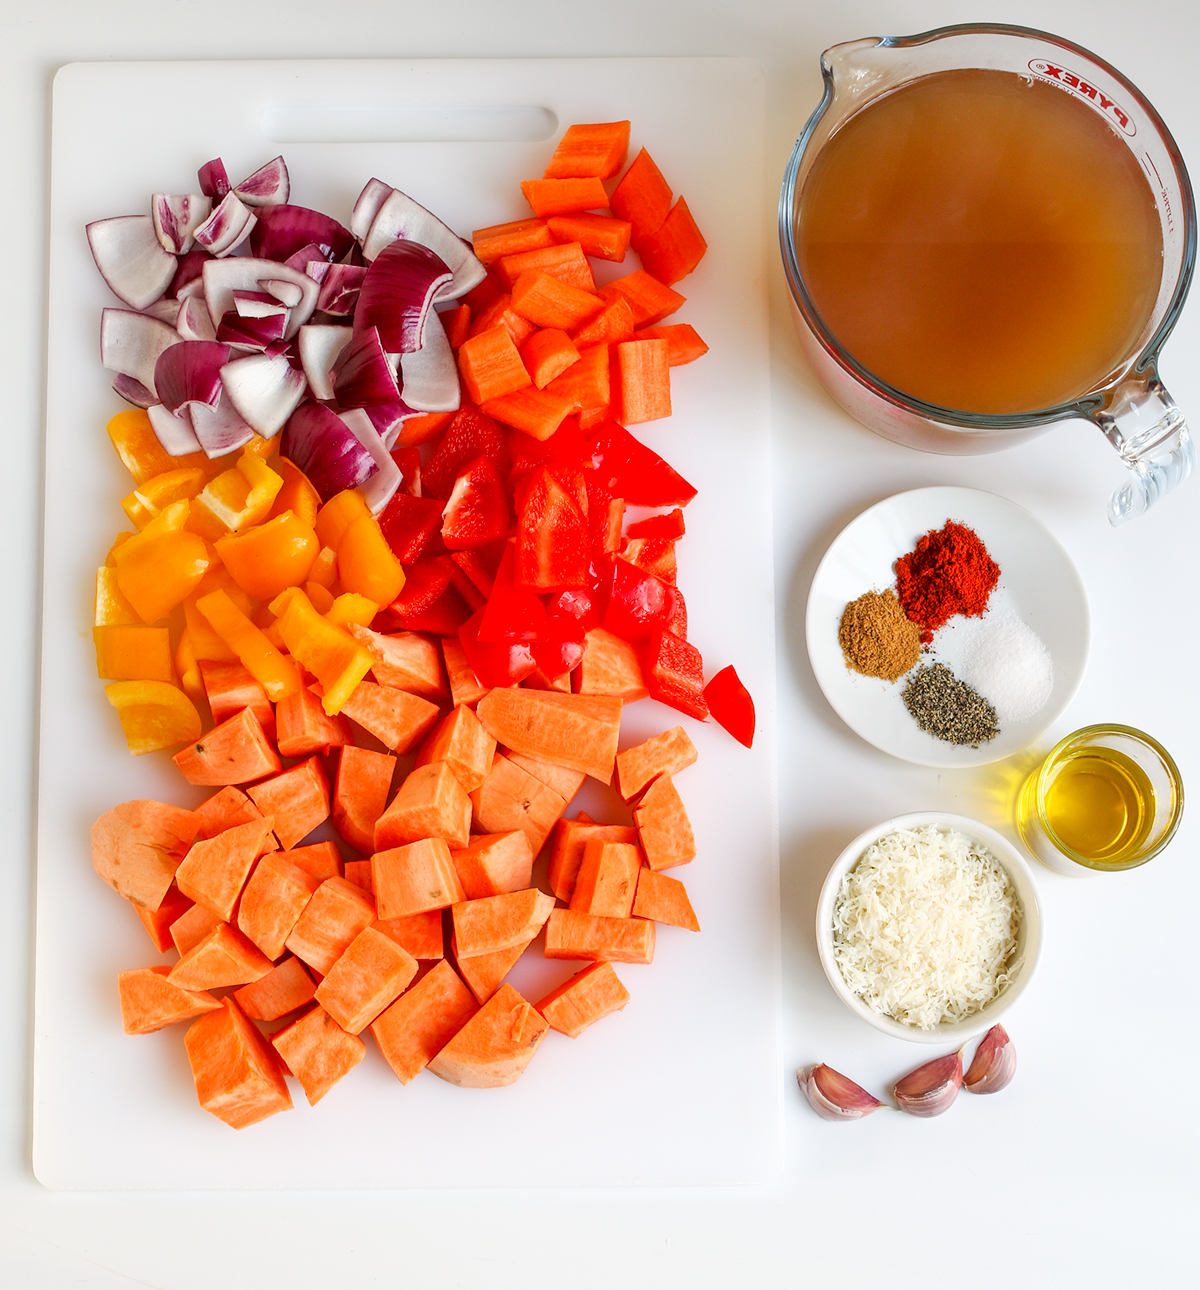 Roasted vegetable and Parmesan Soup Ingredients